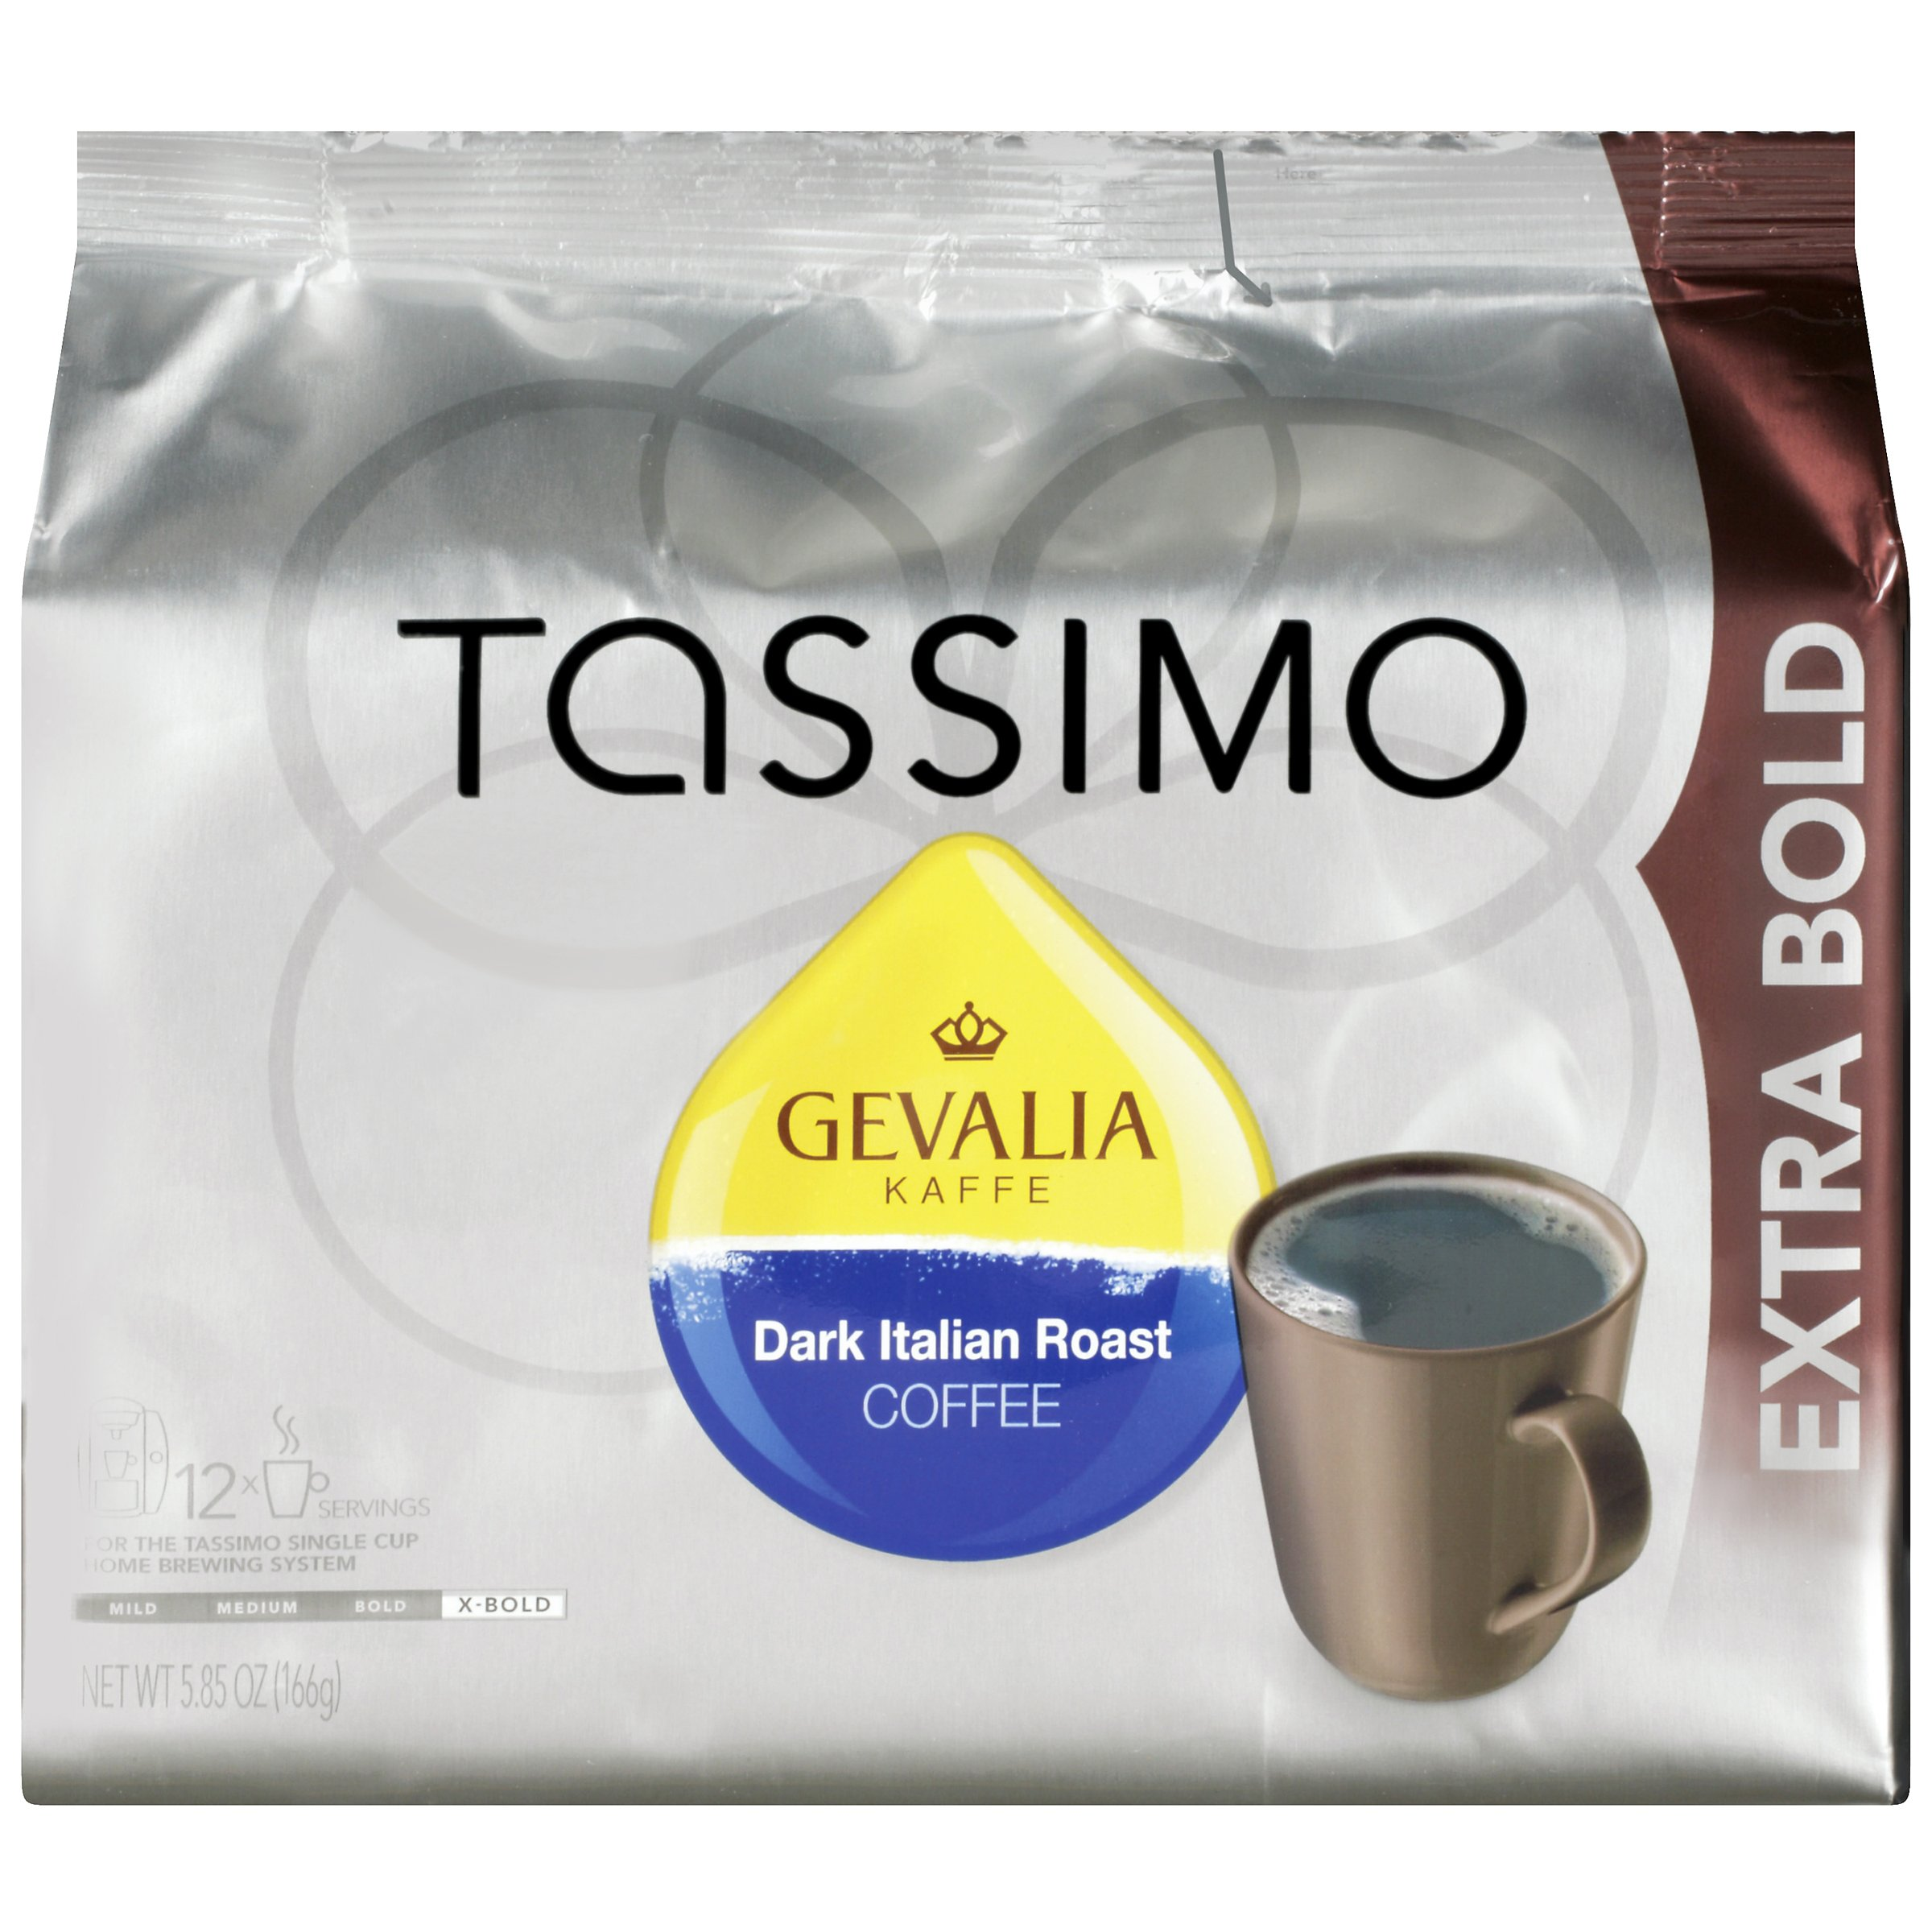 Tassimo GEVALIA  Dark Italian Roast Coffee, Extra Bold, 12 Count T-Discs, 2 Pack by Tassimo GEVALIA